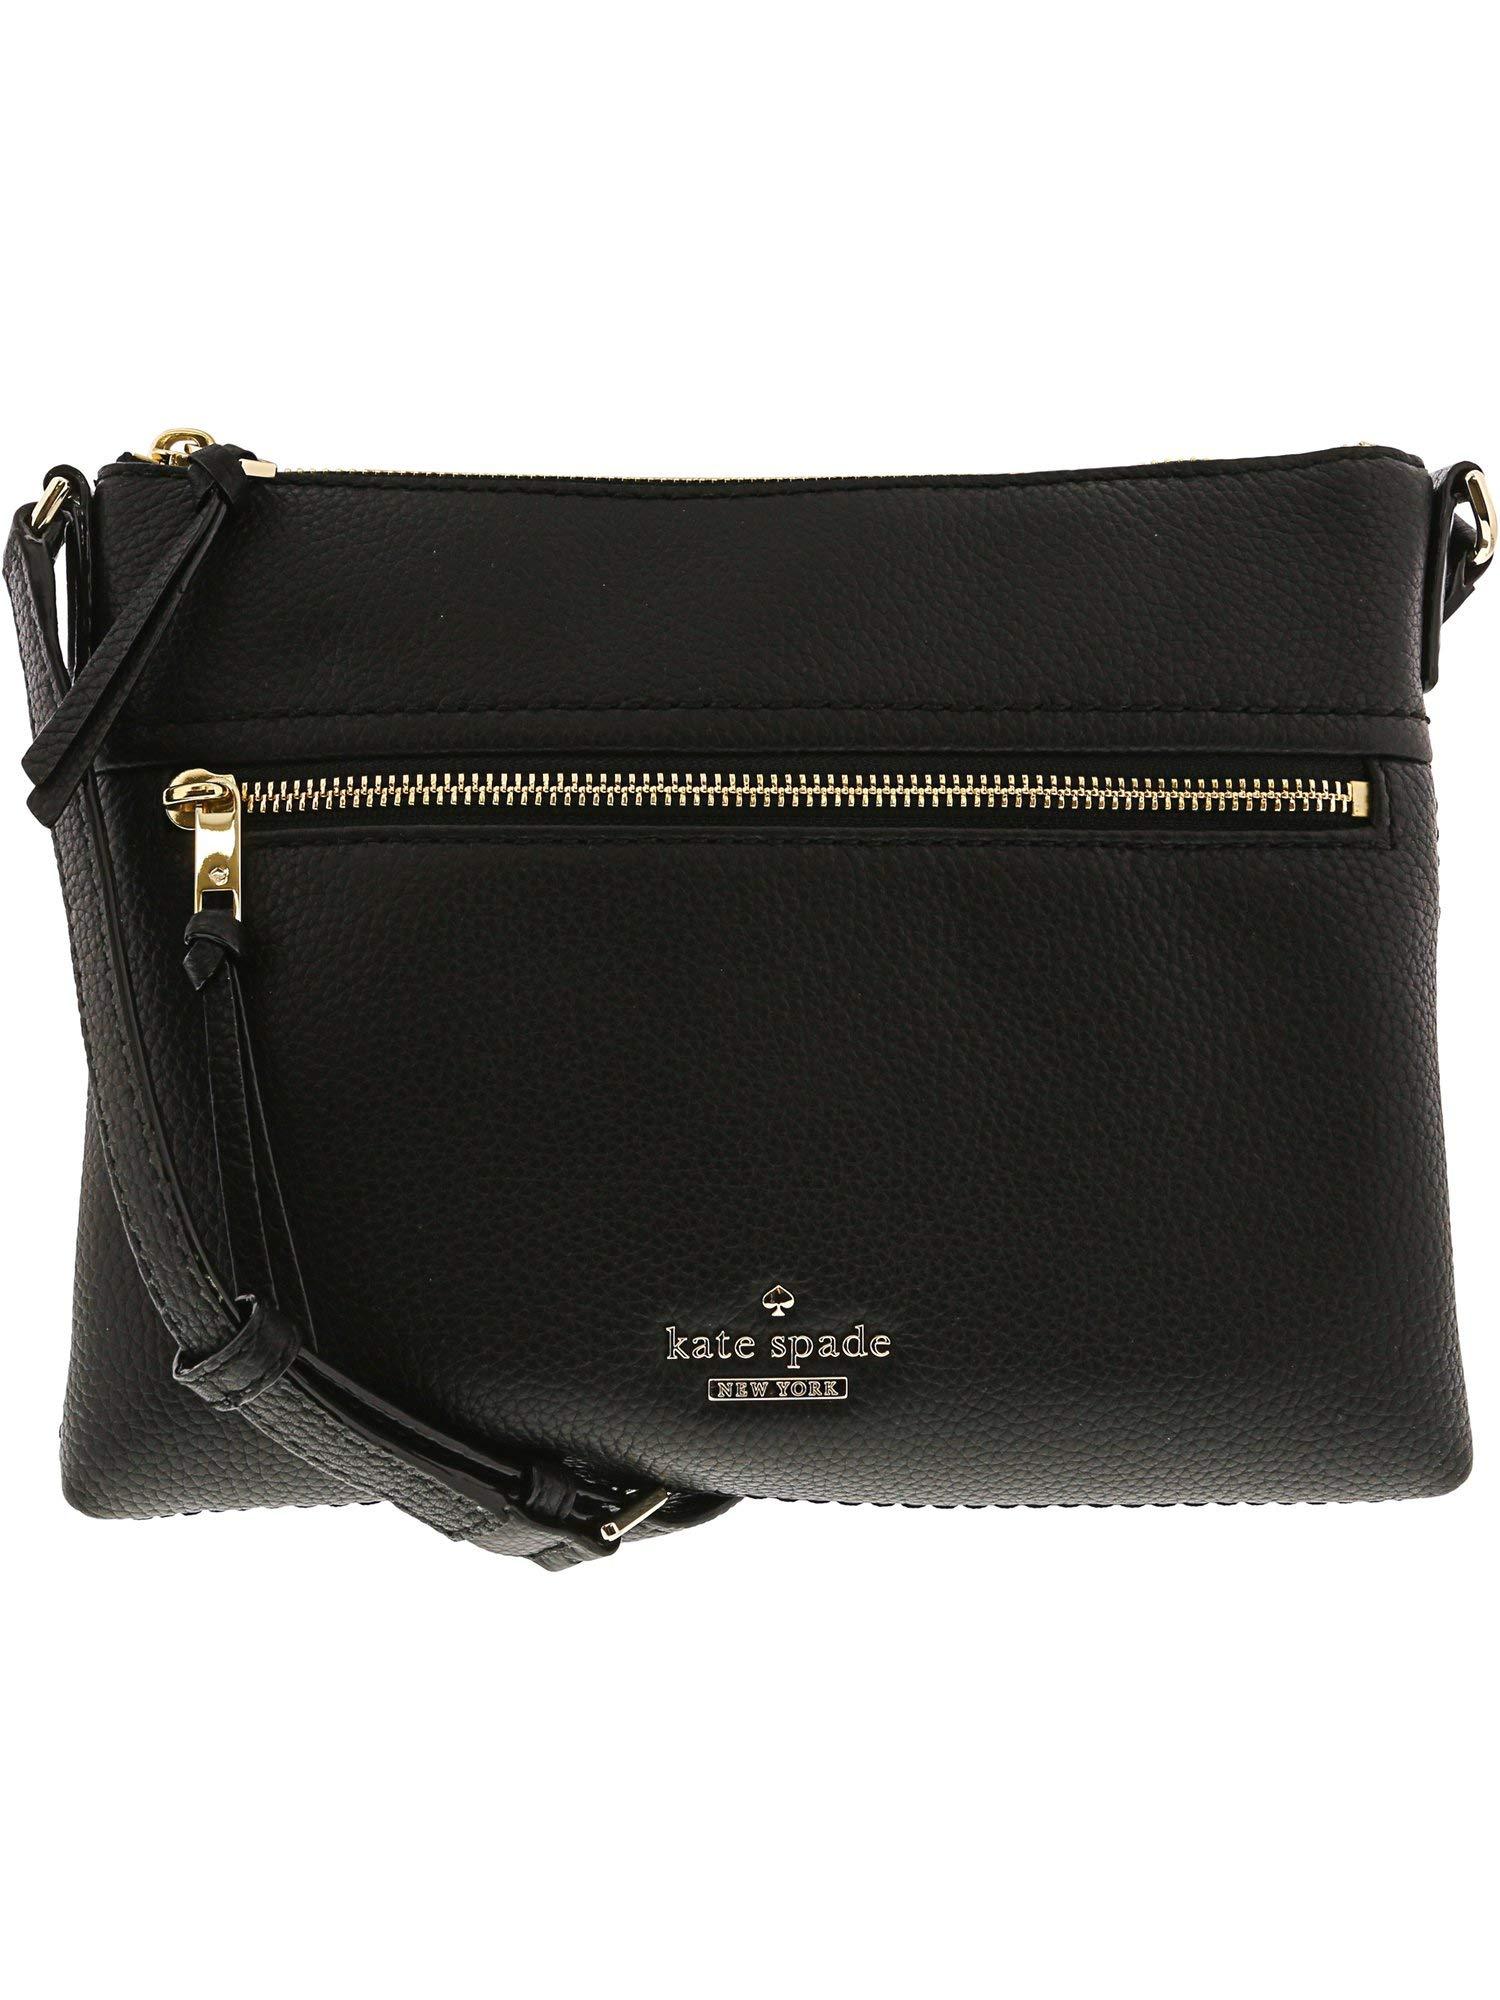 Kate Spade New York Women's Jackson Street Gabriele Bag, Black, One Size